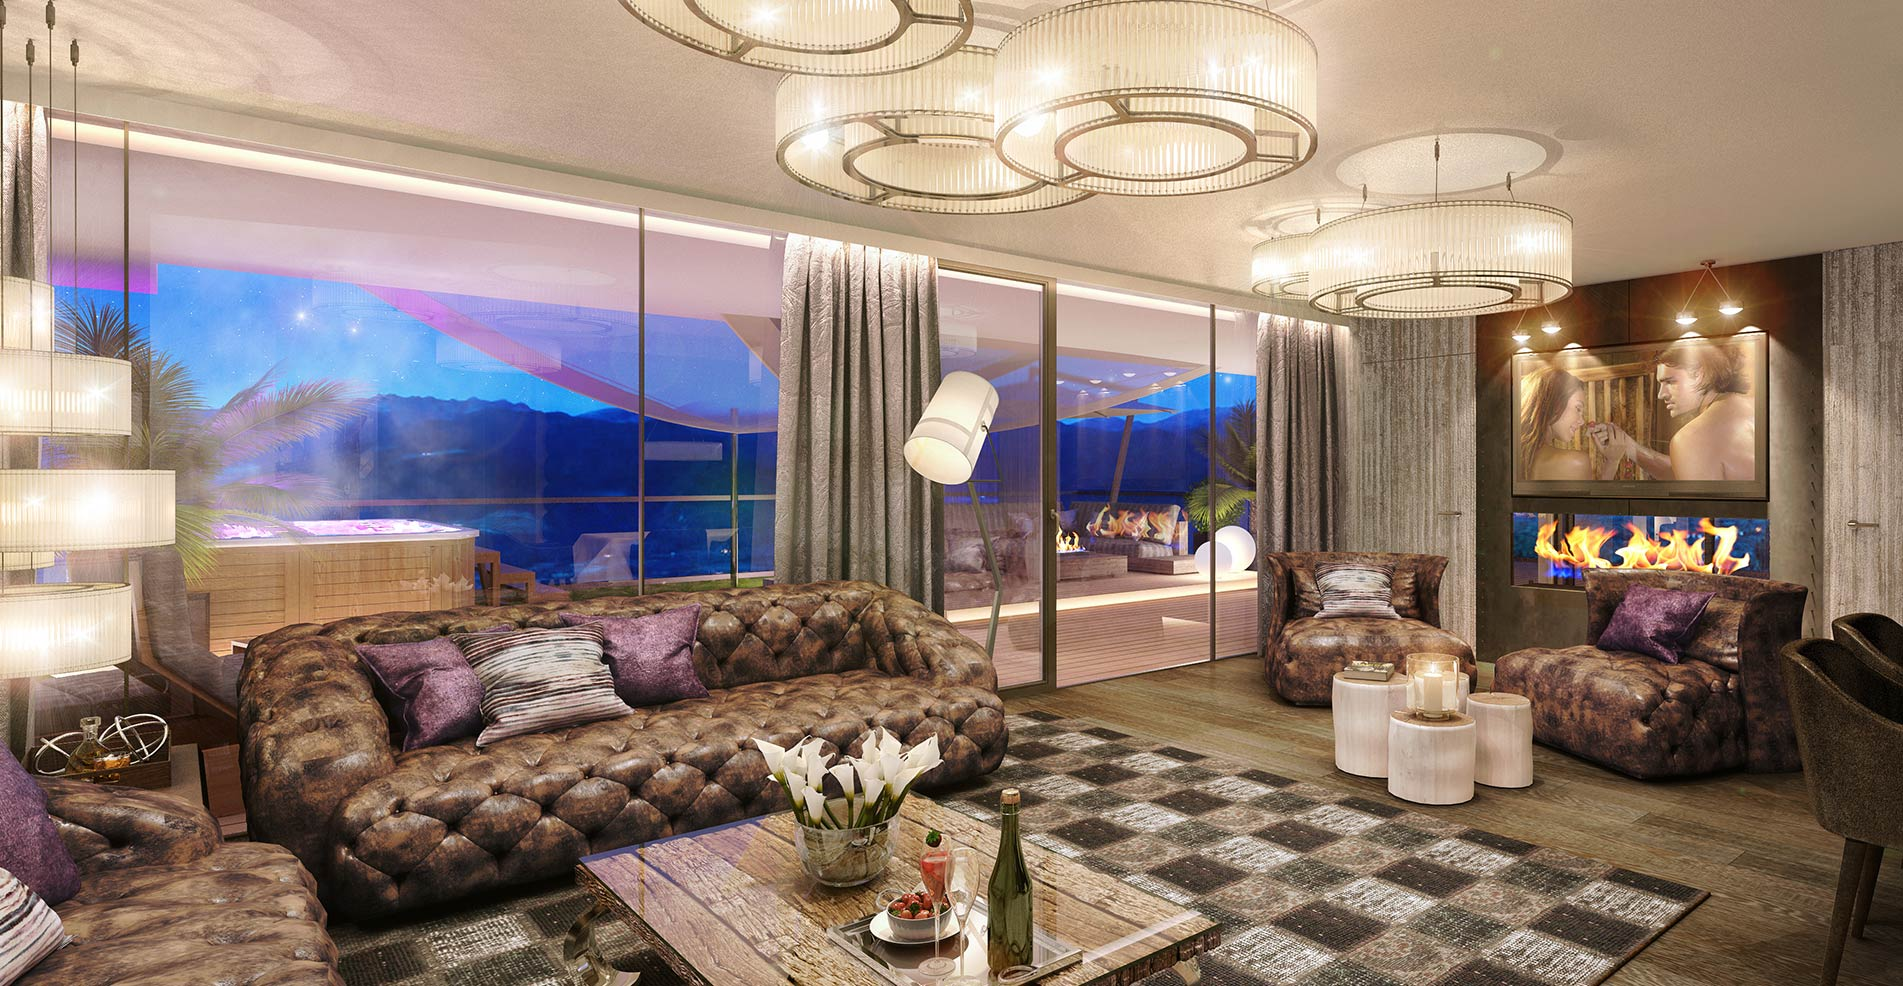 Wellnesshotel s dtirol 5 luxury dolce vita hotel for Design wellnesshotel sudtirol